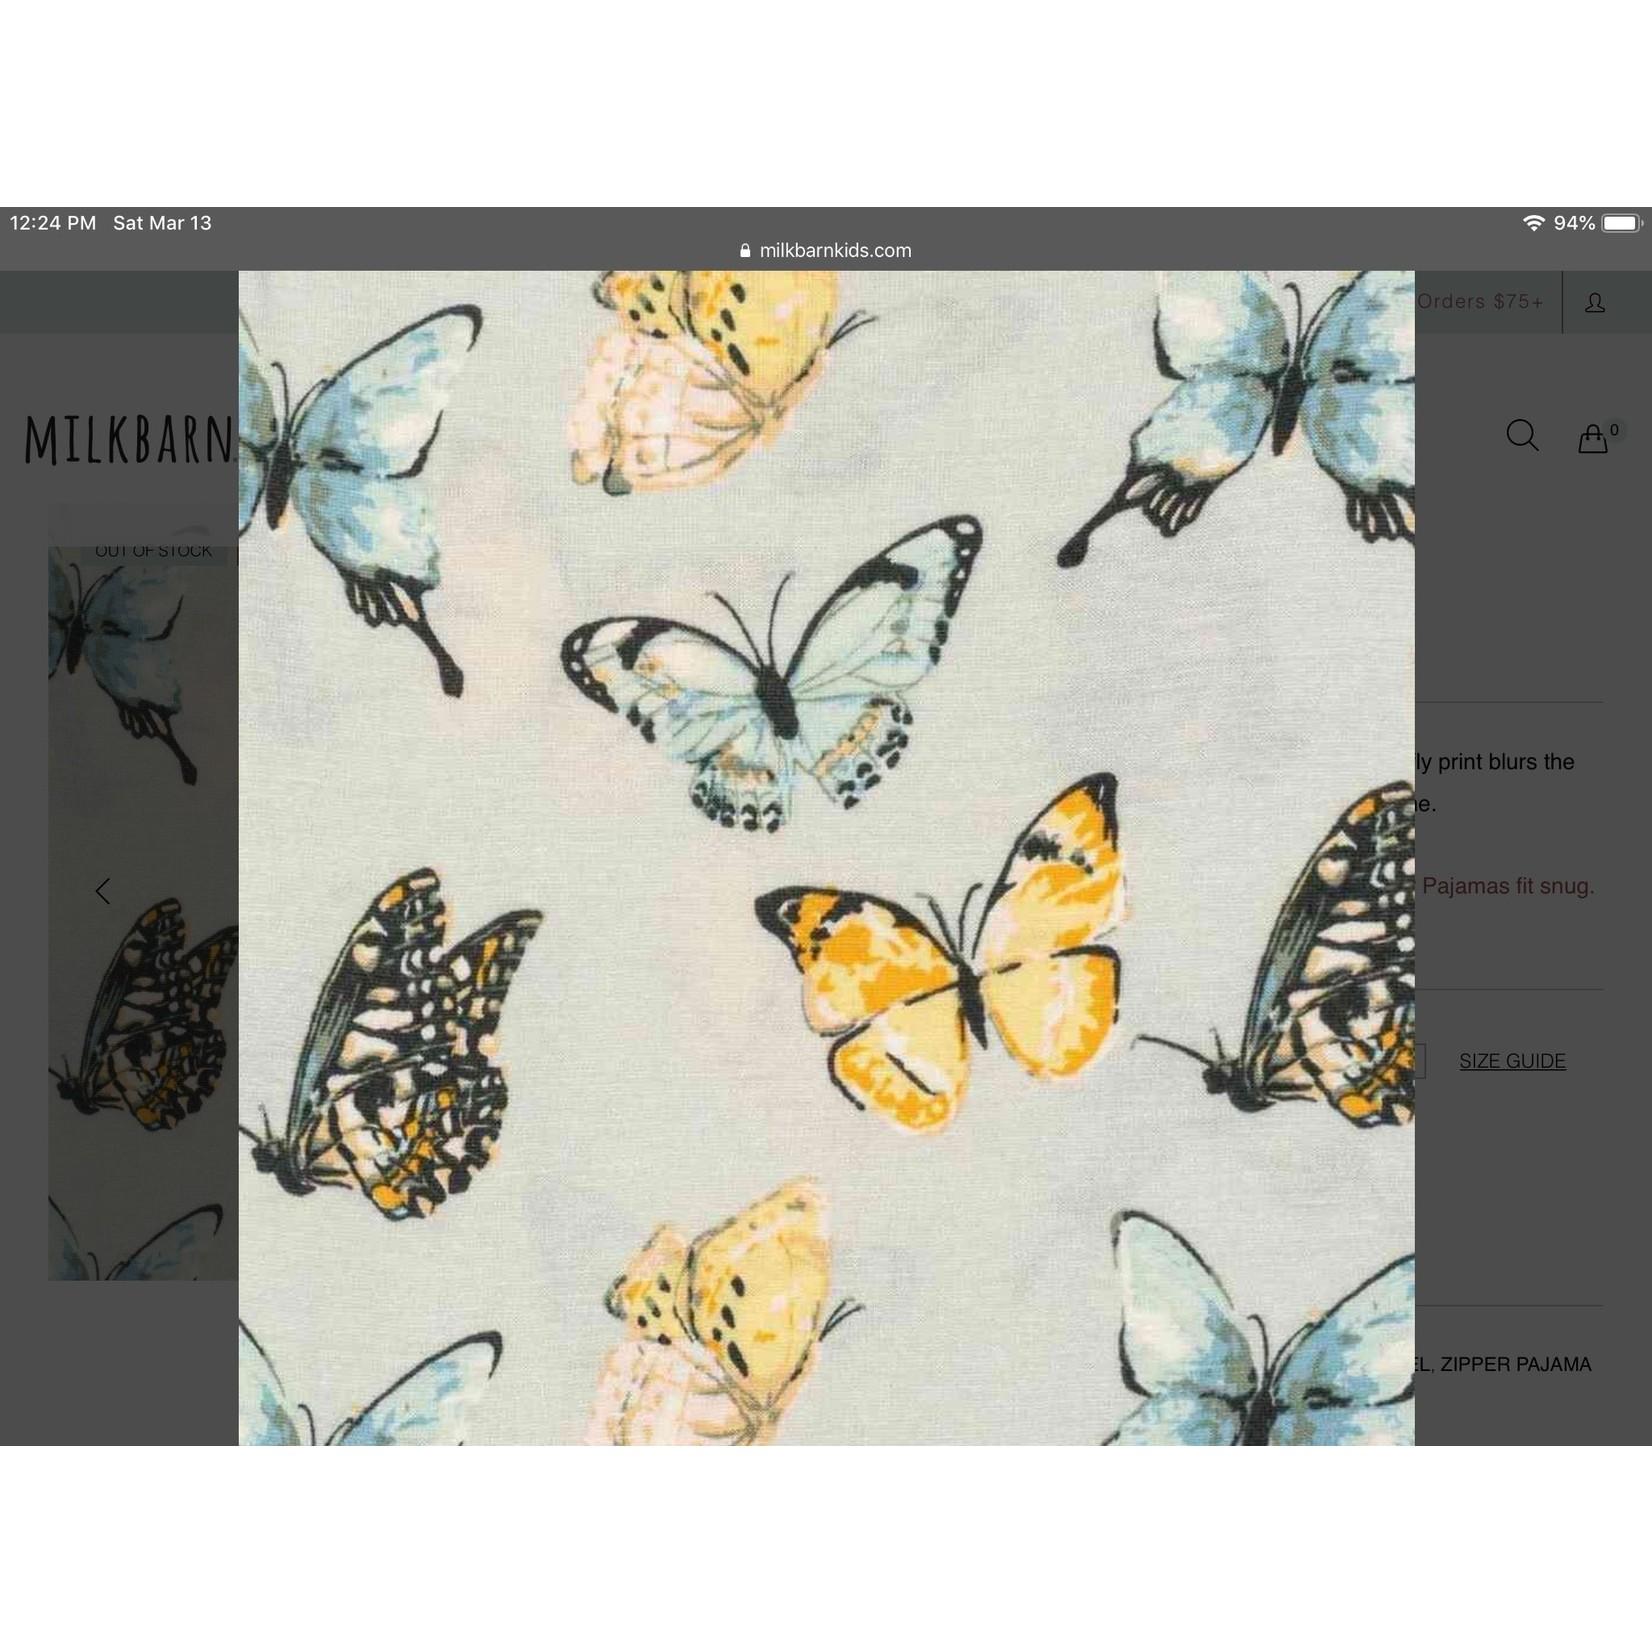 Milkbarn One piece 3-6 M Butterflies